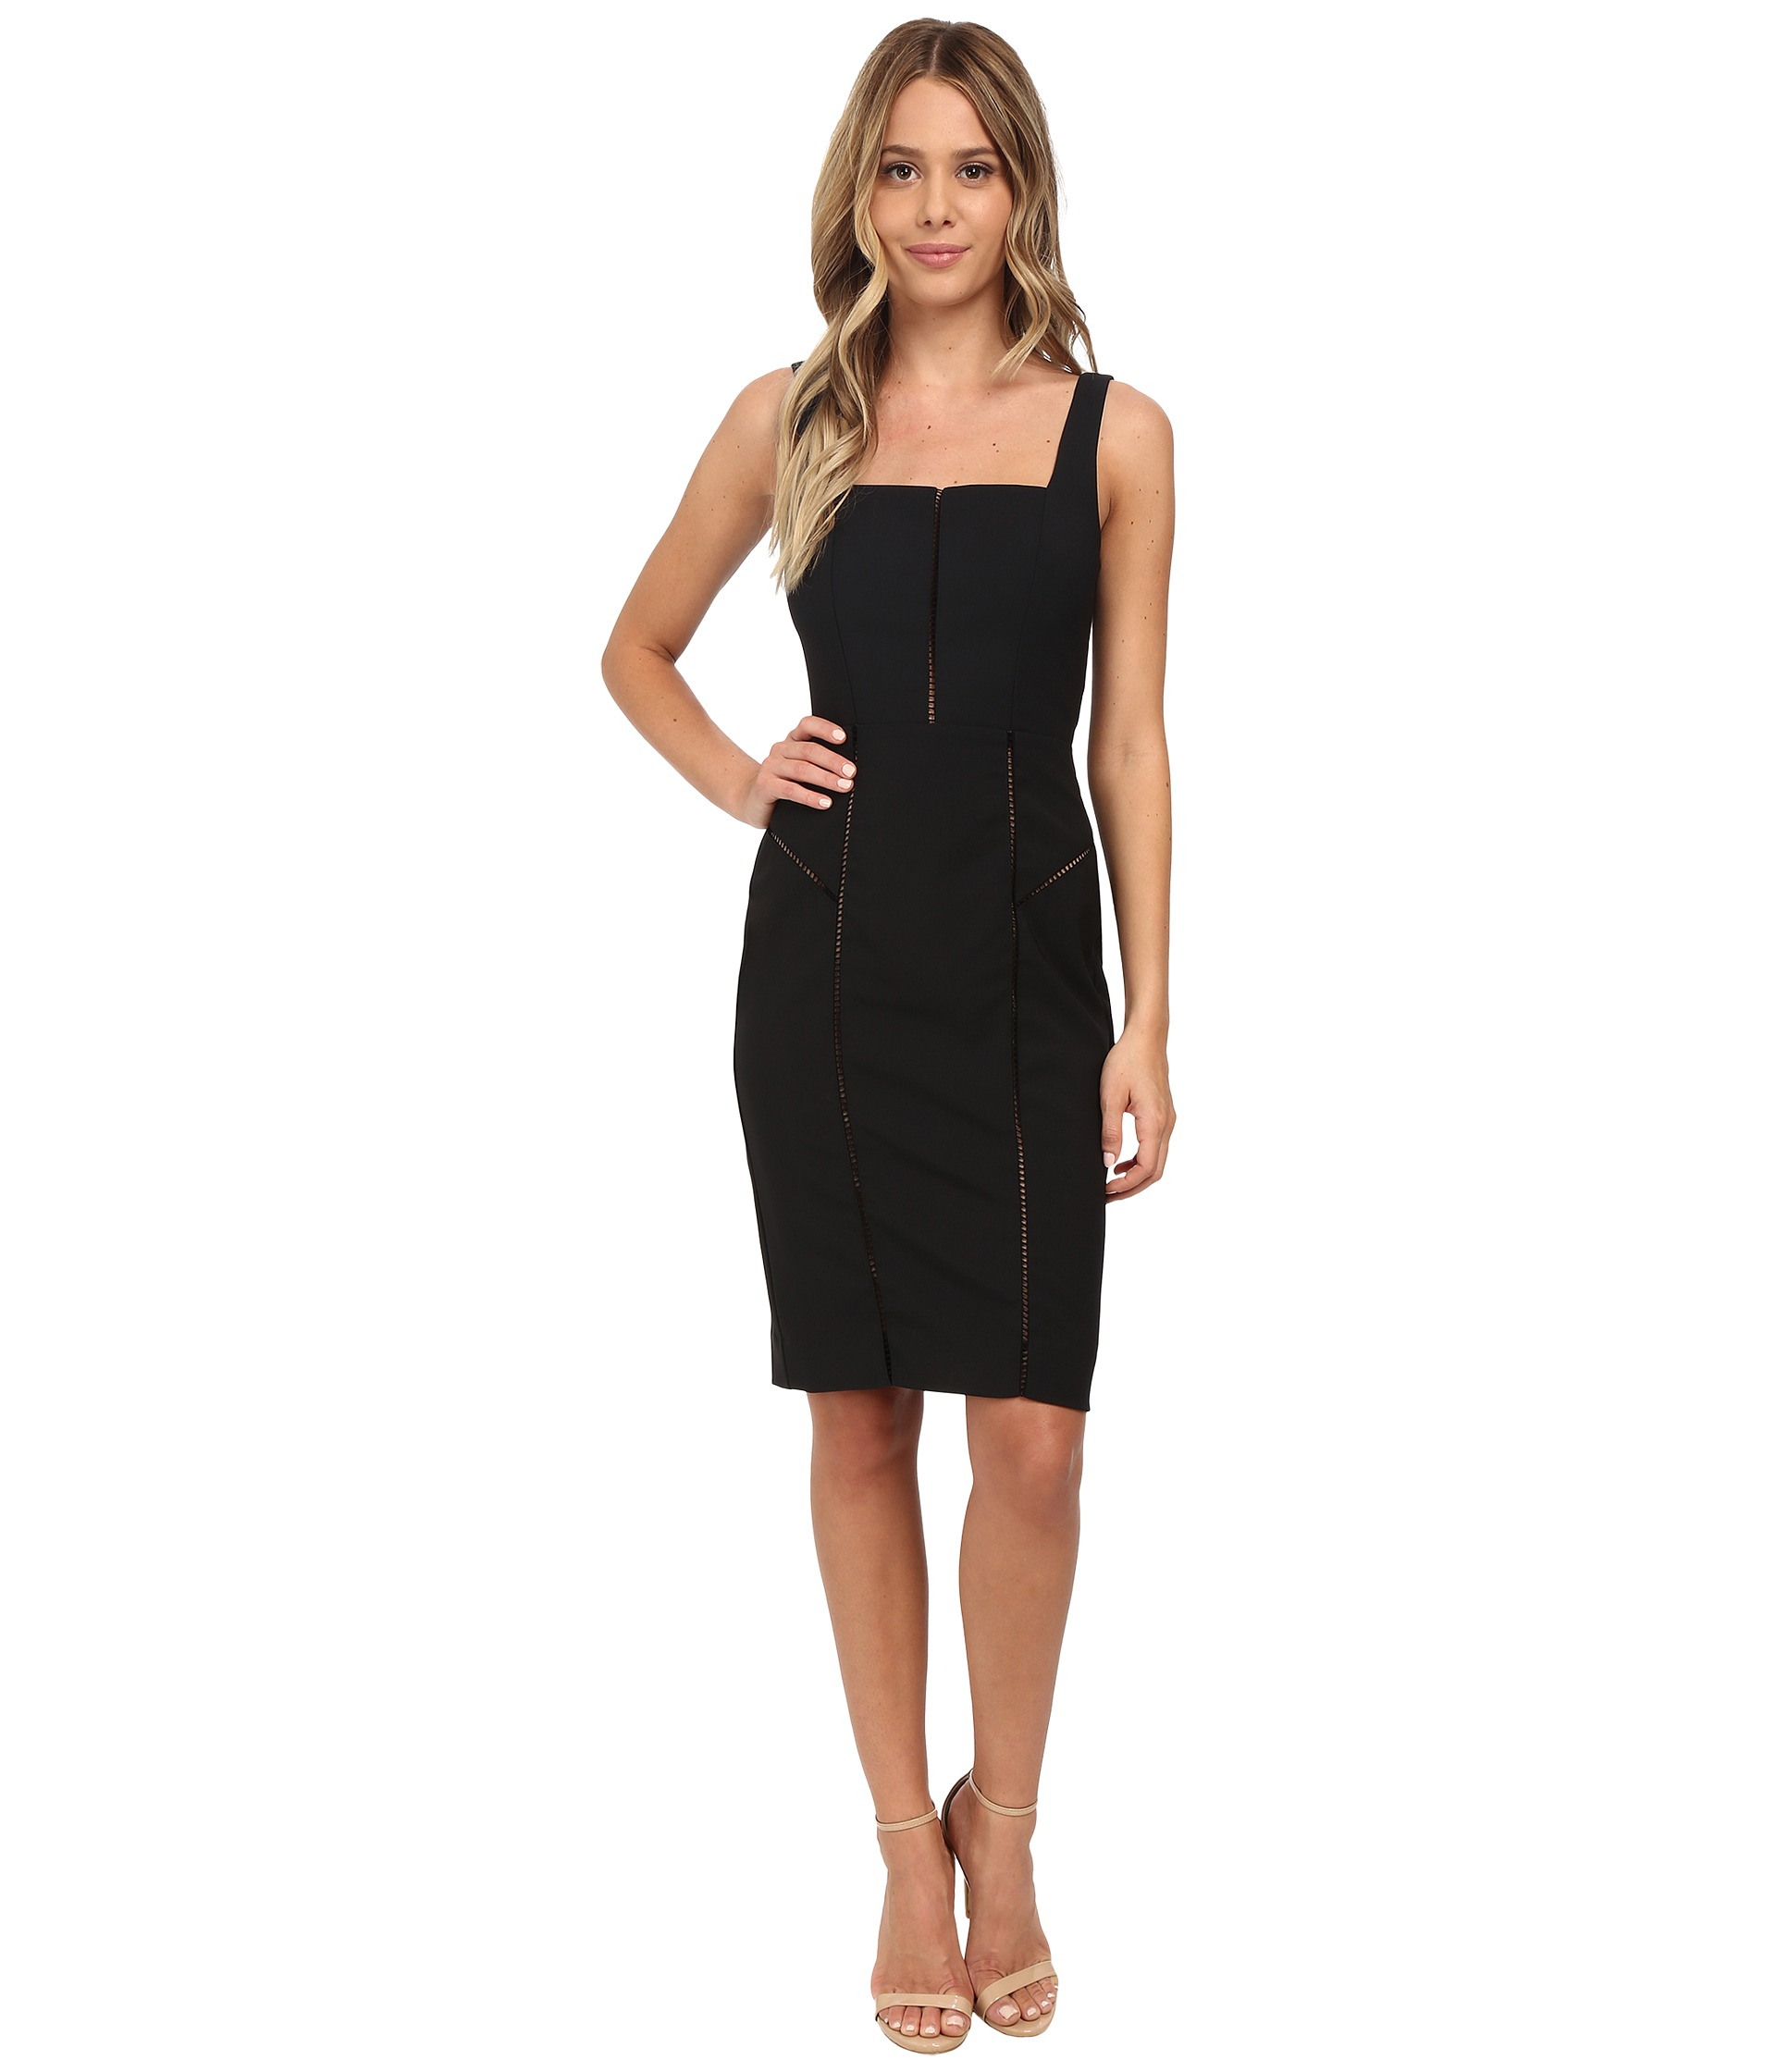 Nicole miller Alaiya Square Neck Cocktail Dress in Black | Lyst